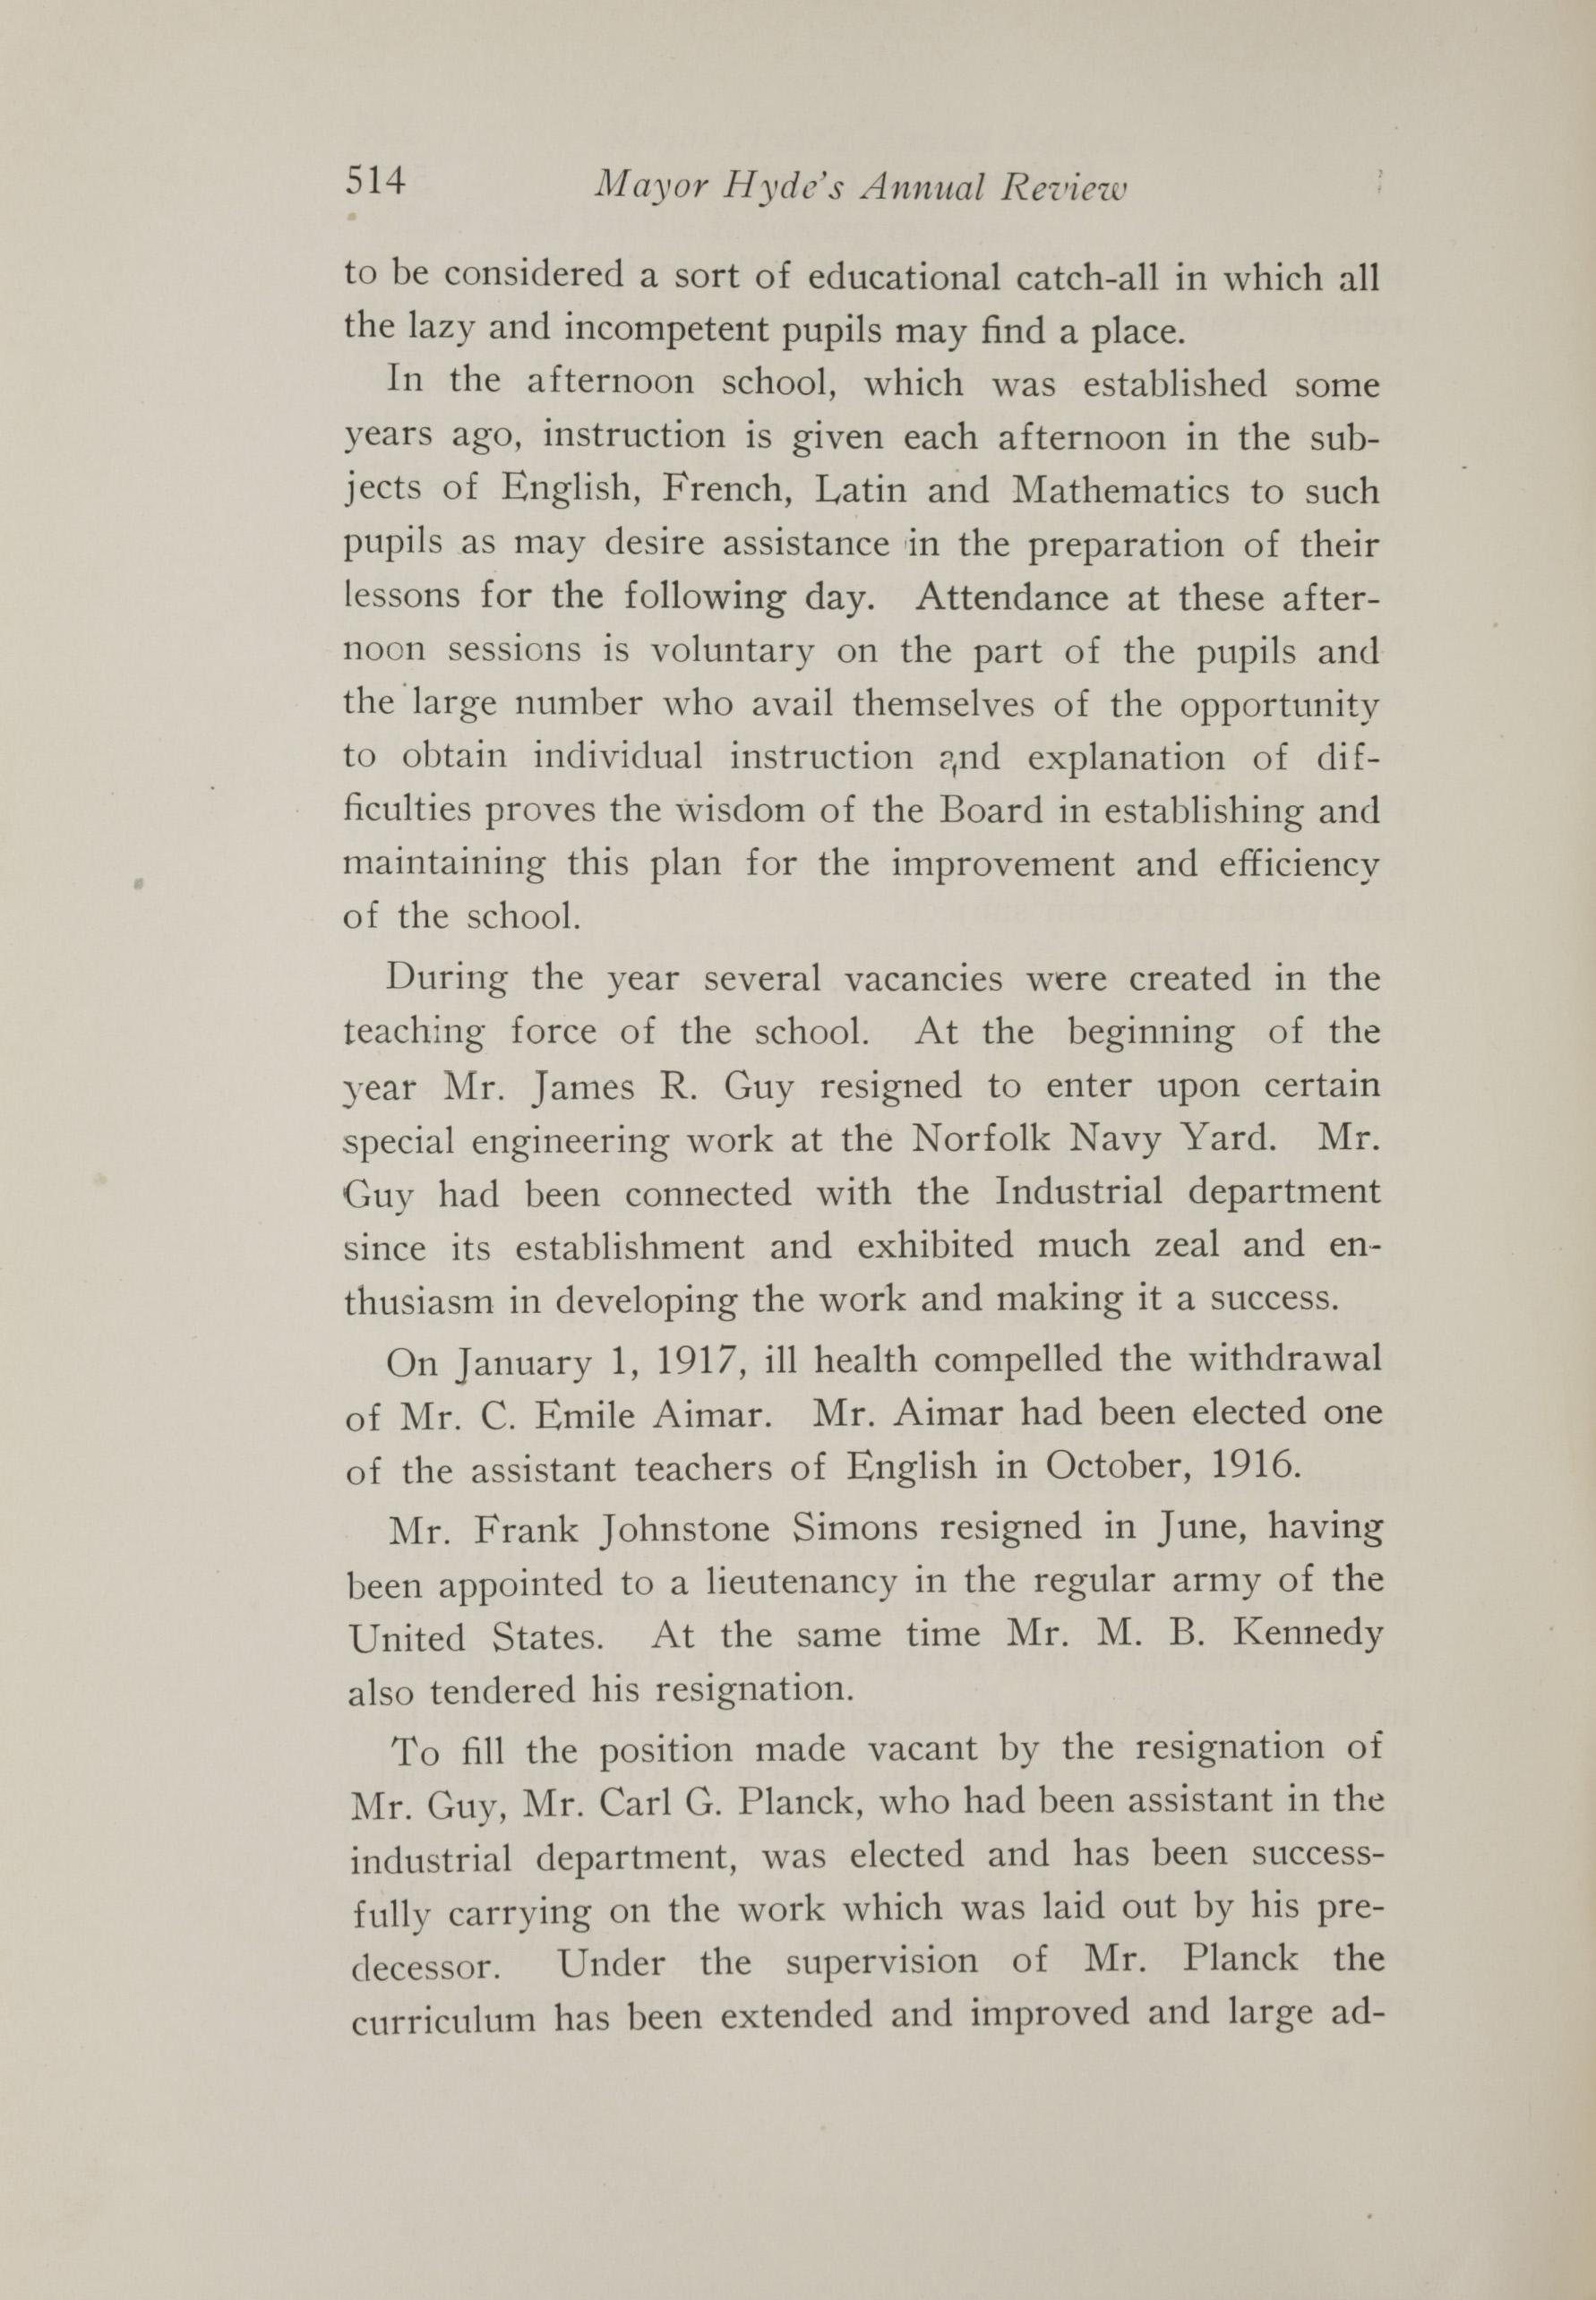 Charleston Yearbook, 1917, page 514